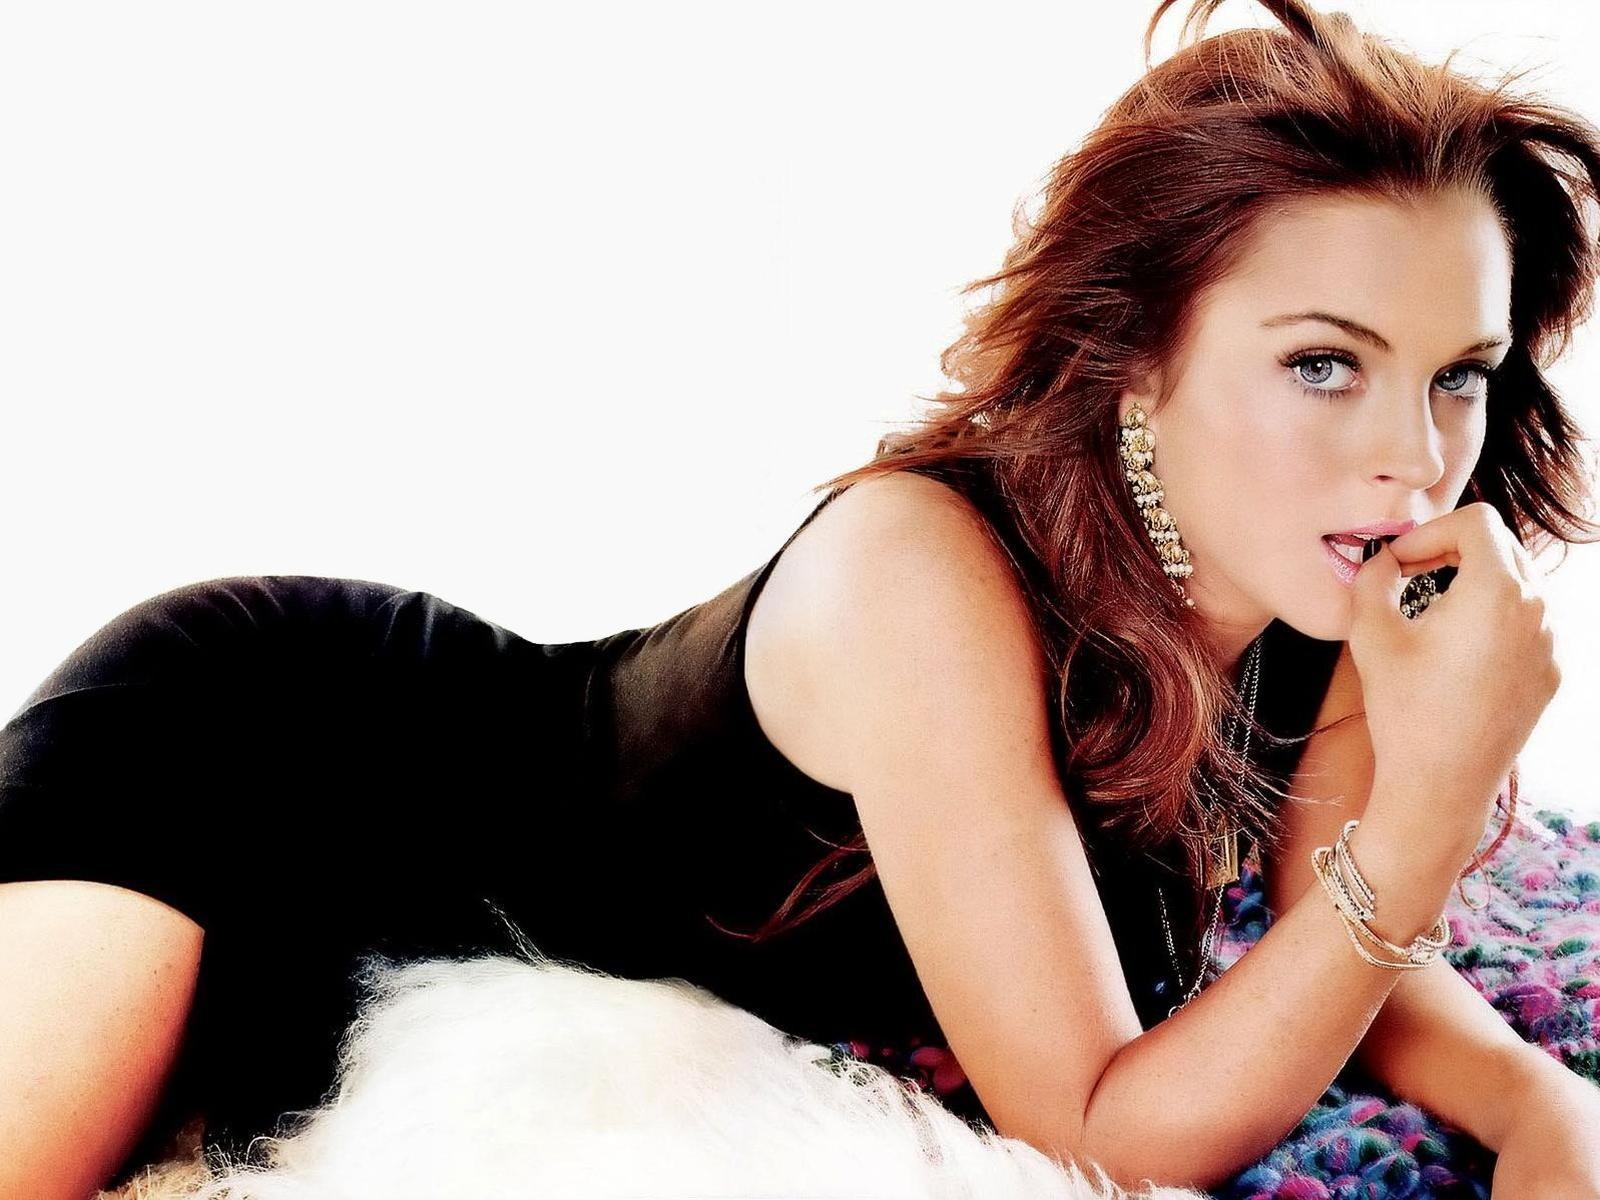 http://1.bp.blogspot.com/-708B12jMWnU/TWWHF17WHII/AAAAAAAABkM/RoqXq5WSqdg/s1600/Lindsay-Lohan+2.jpg